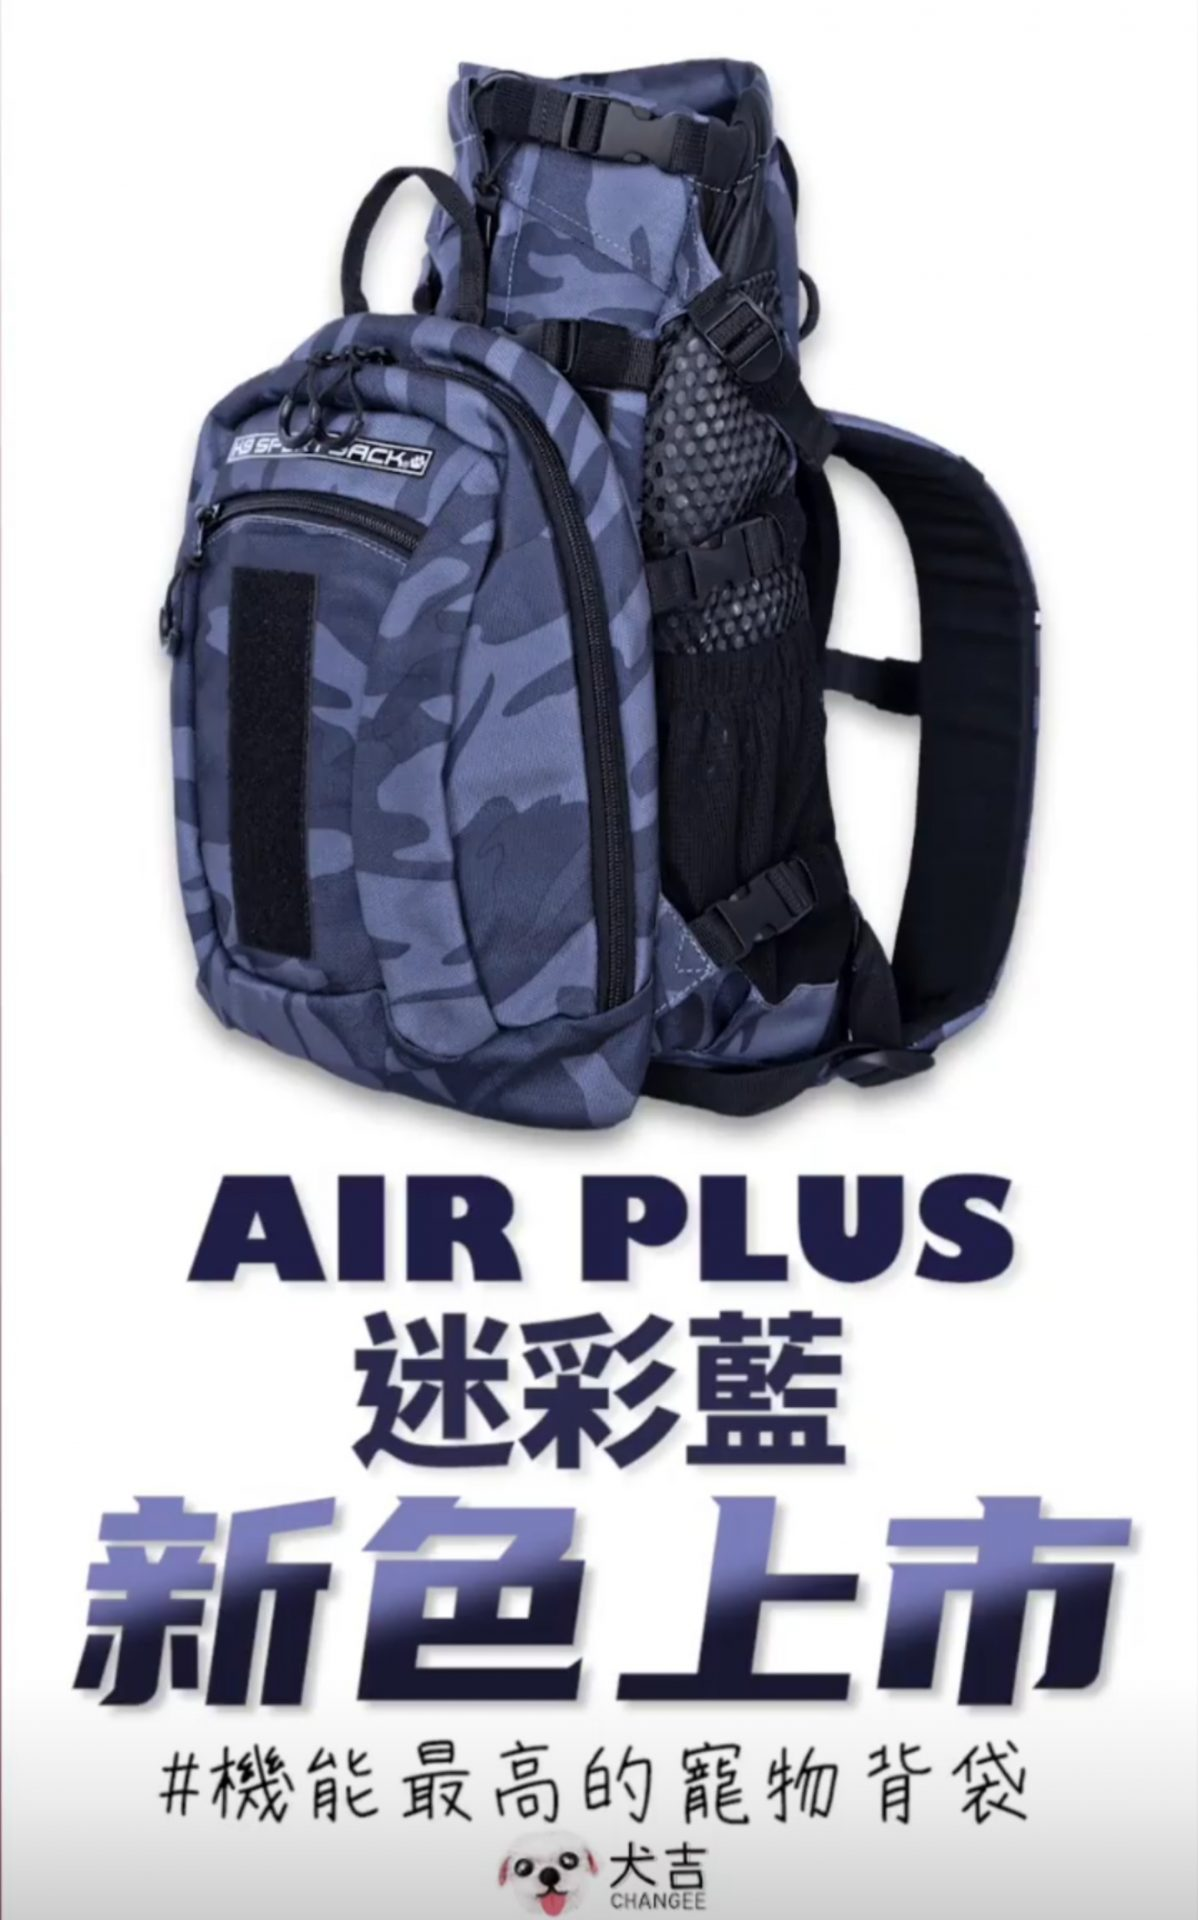 airplus 迷彩藍